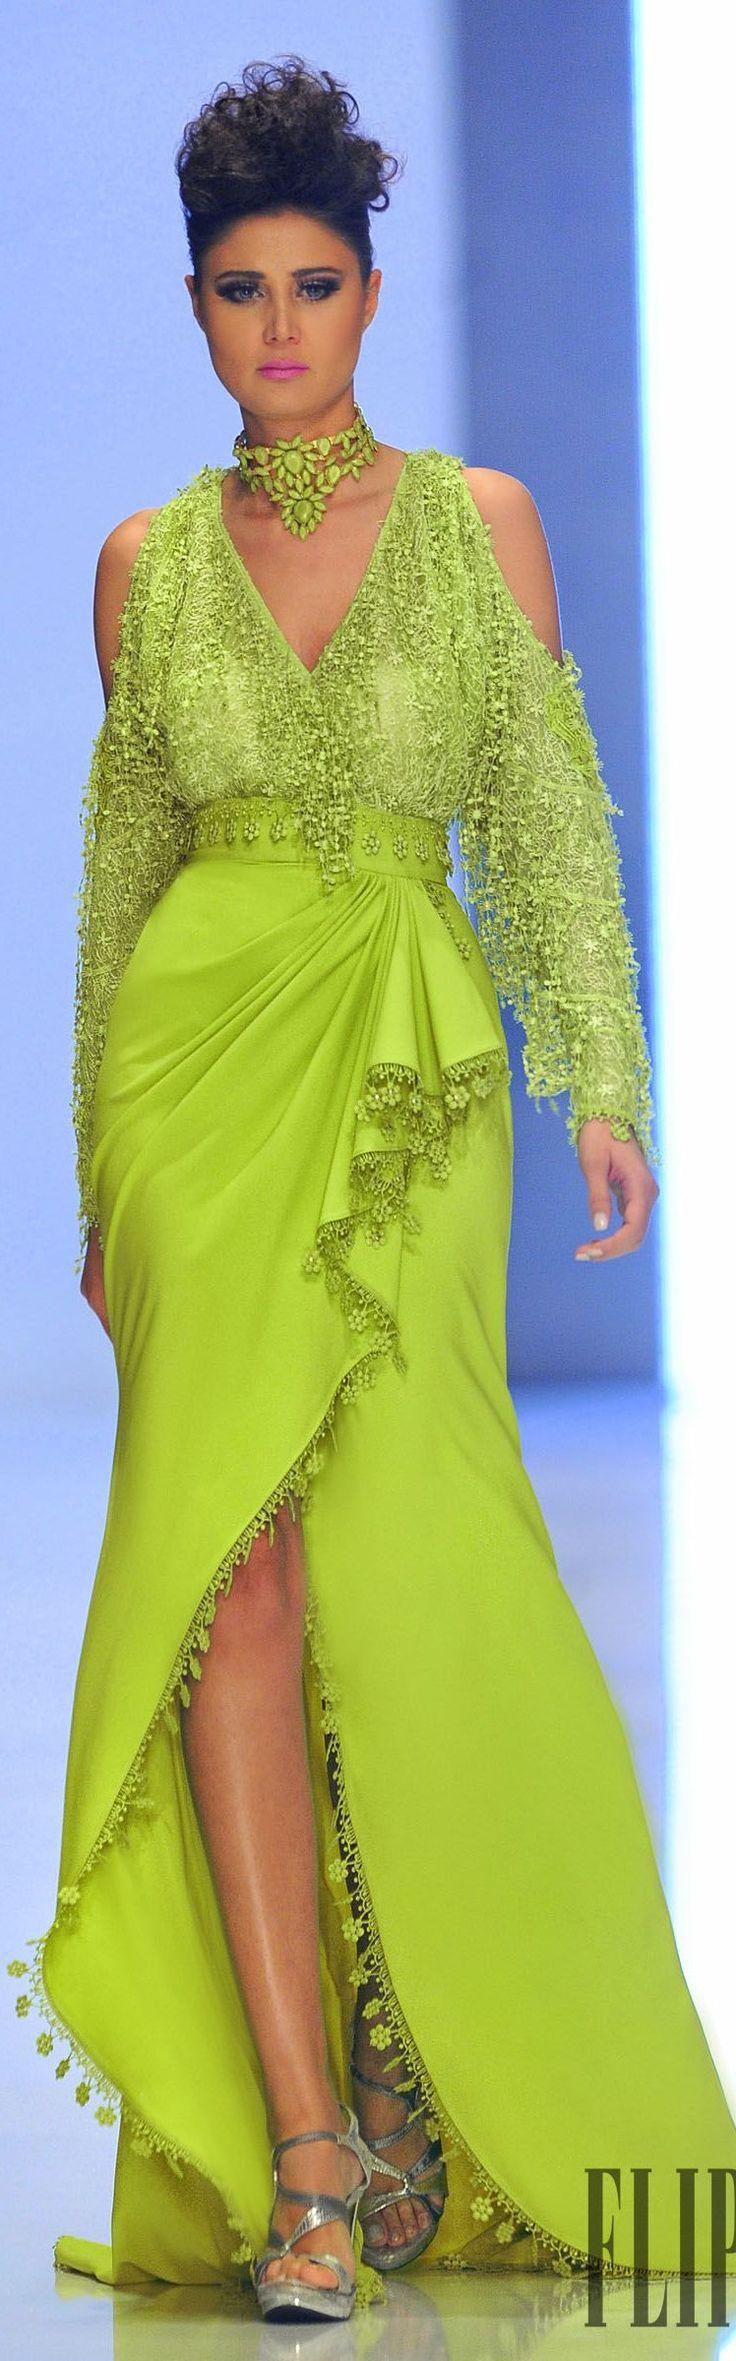 best Beautiful dresses images on Pinterest